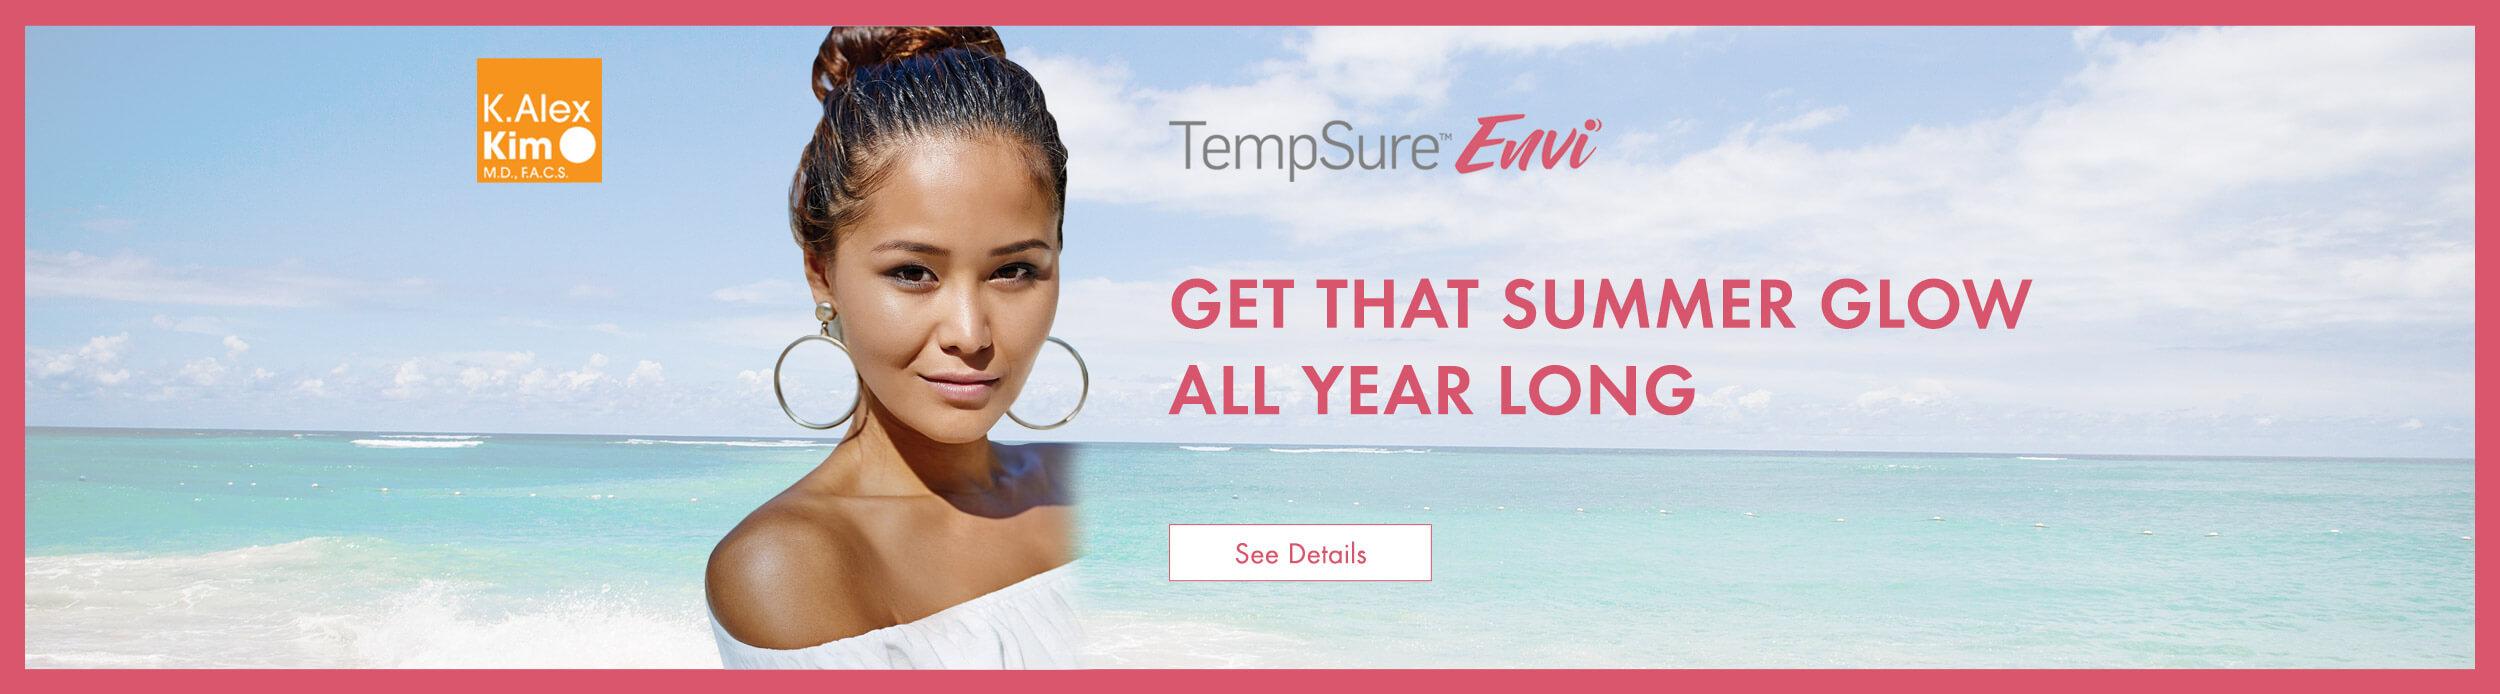 Tempsure Envi GET THAT SUMMER GLOW ALL YEAR LONG